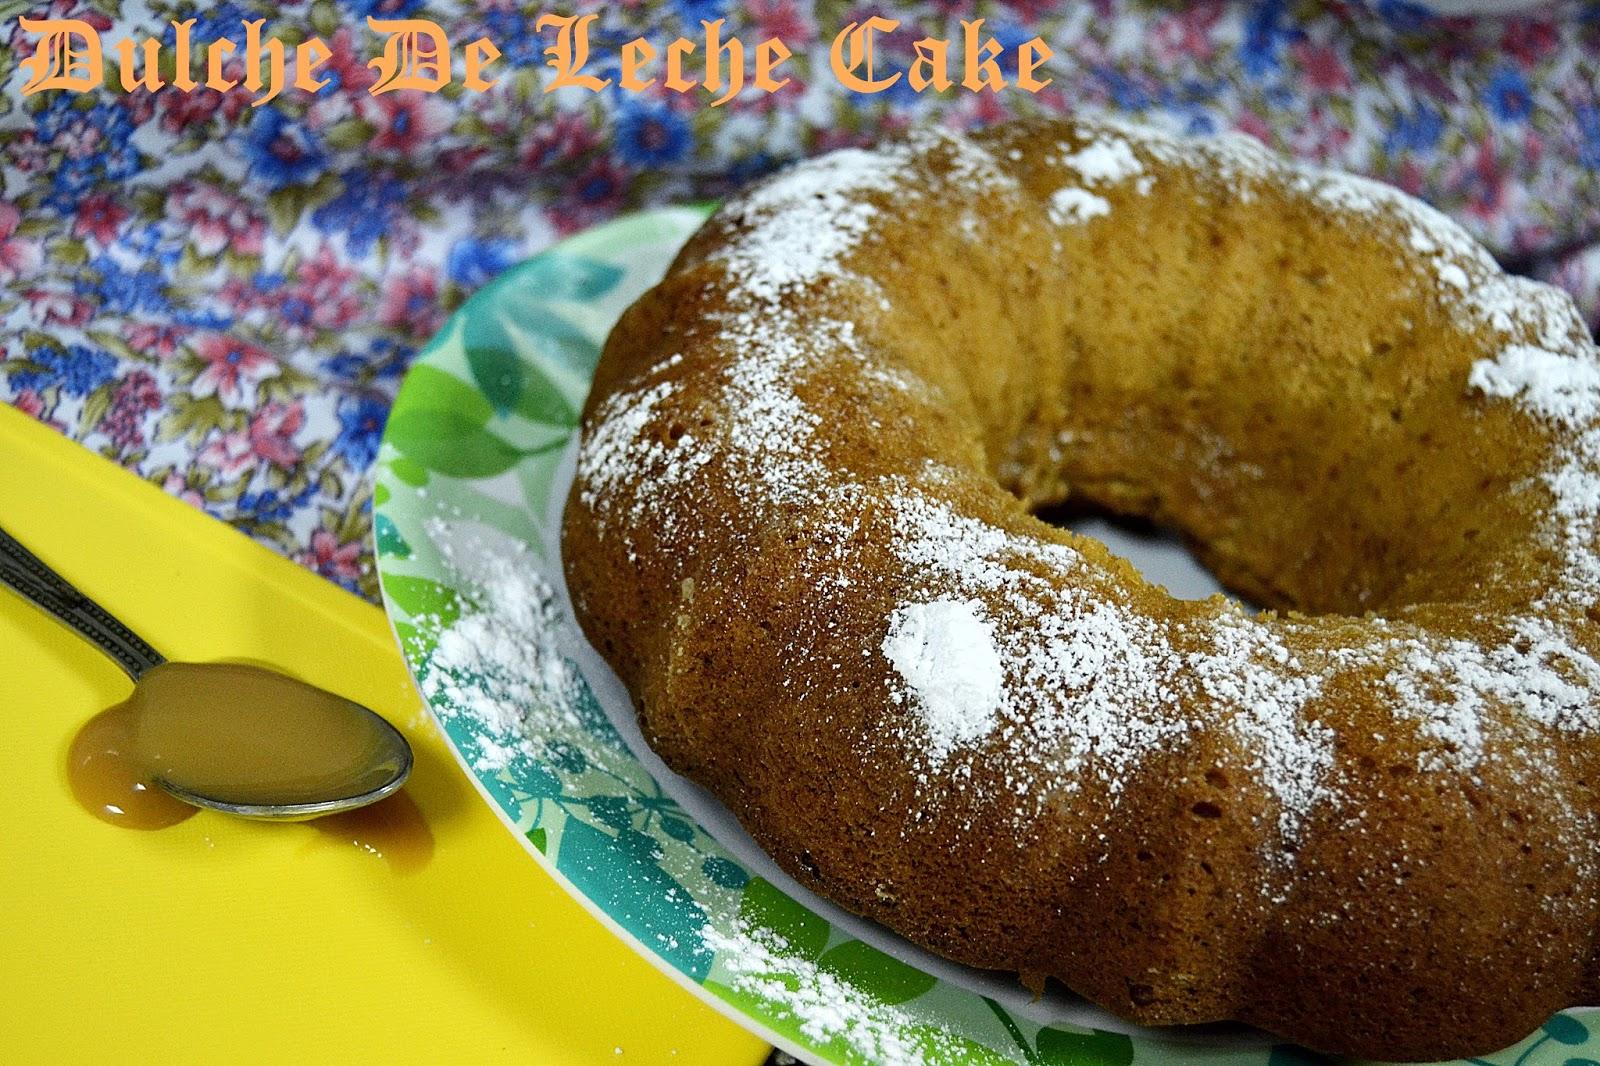 Baking, Cakes & Frostings, bundt cake, bundt cake recipes,dulce de leche bundt cake, easy bundt cake recipes,dulce de leche cake,bundt cake glaze